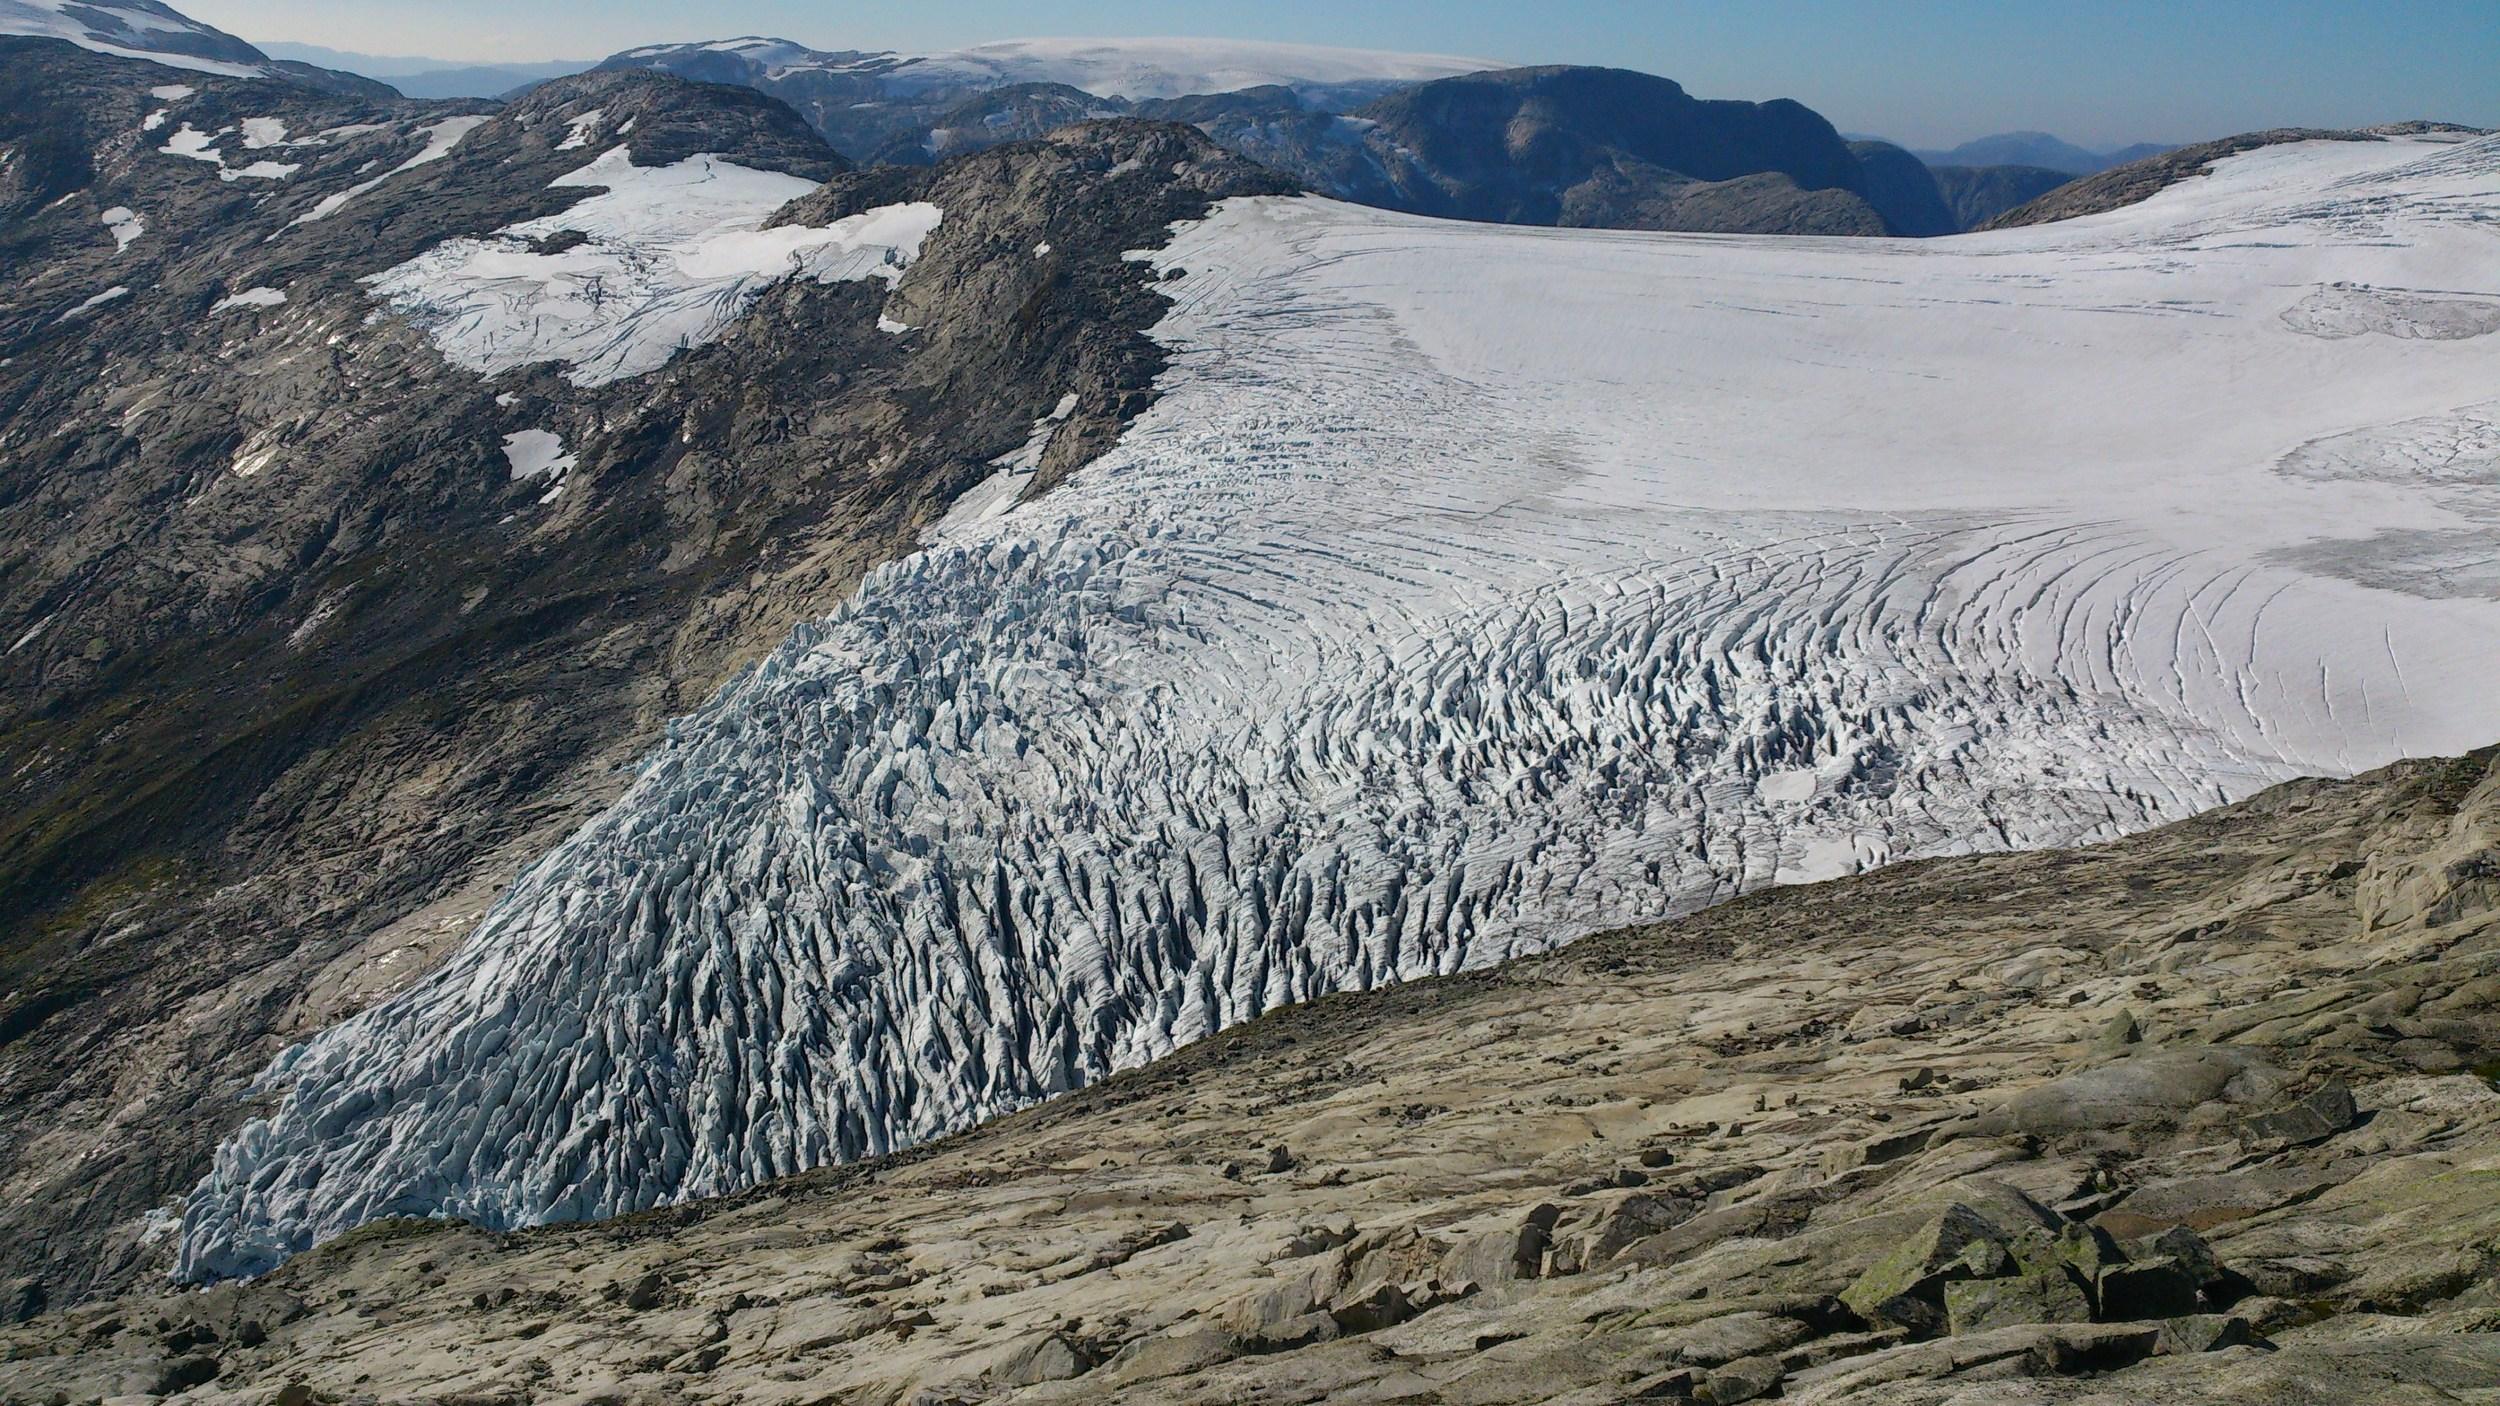 Vetle Bøyabreen Glacier 2014. Photo: Pål Gran Kielland.